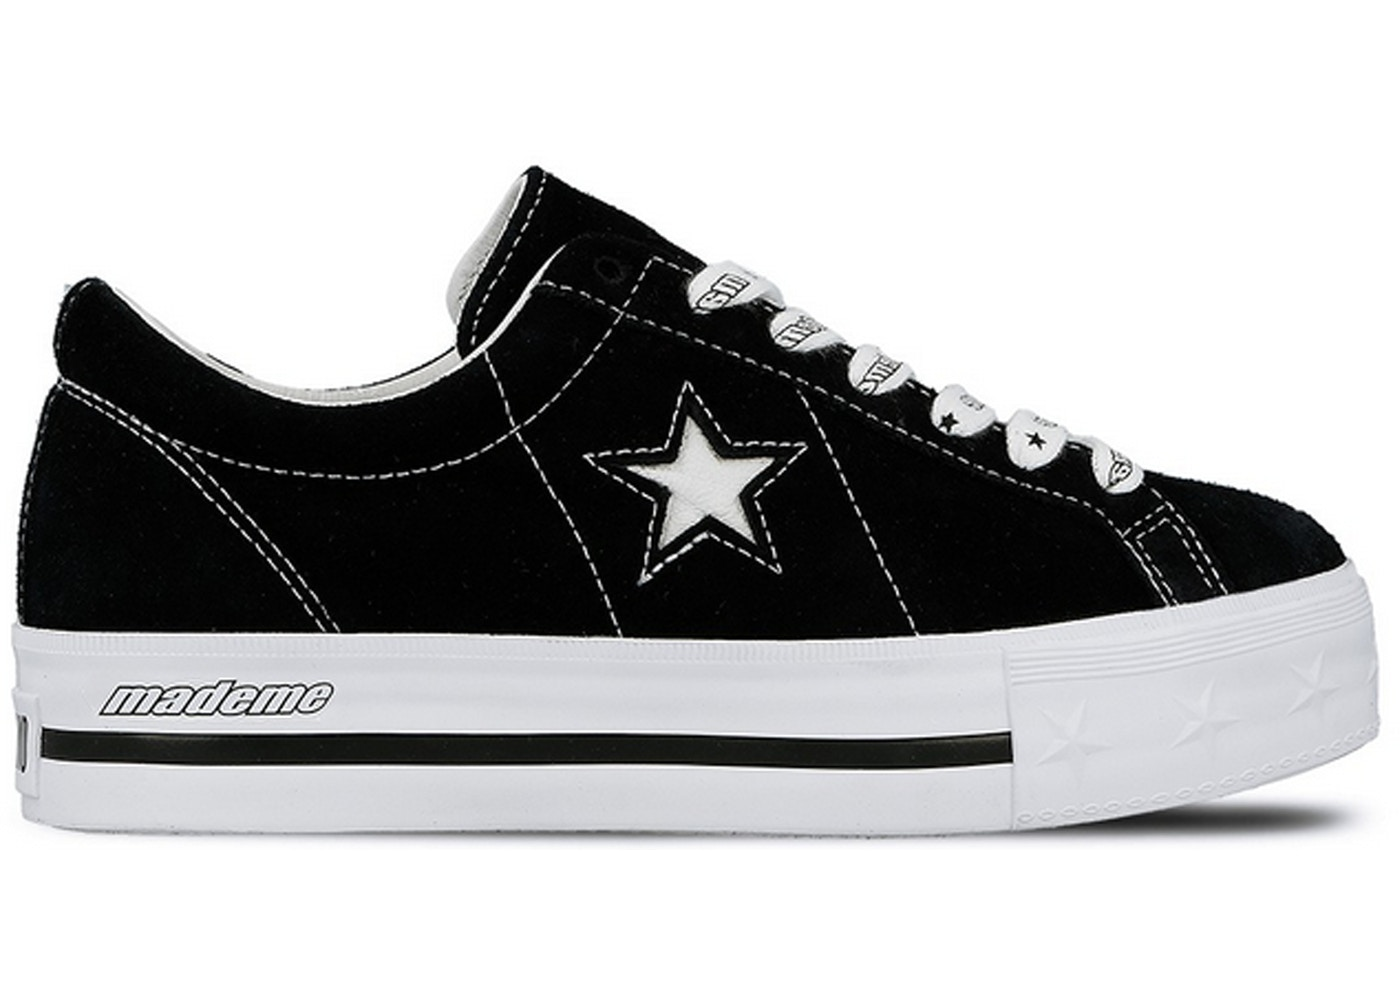 3ea7d44a391266 Converse One Star Platform Ox MadeMe Black (W) - 562959C